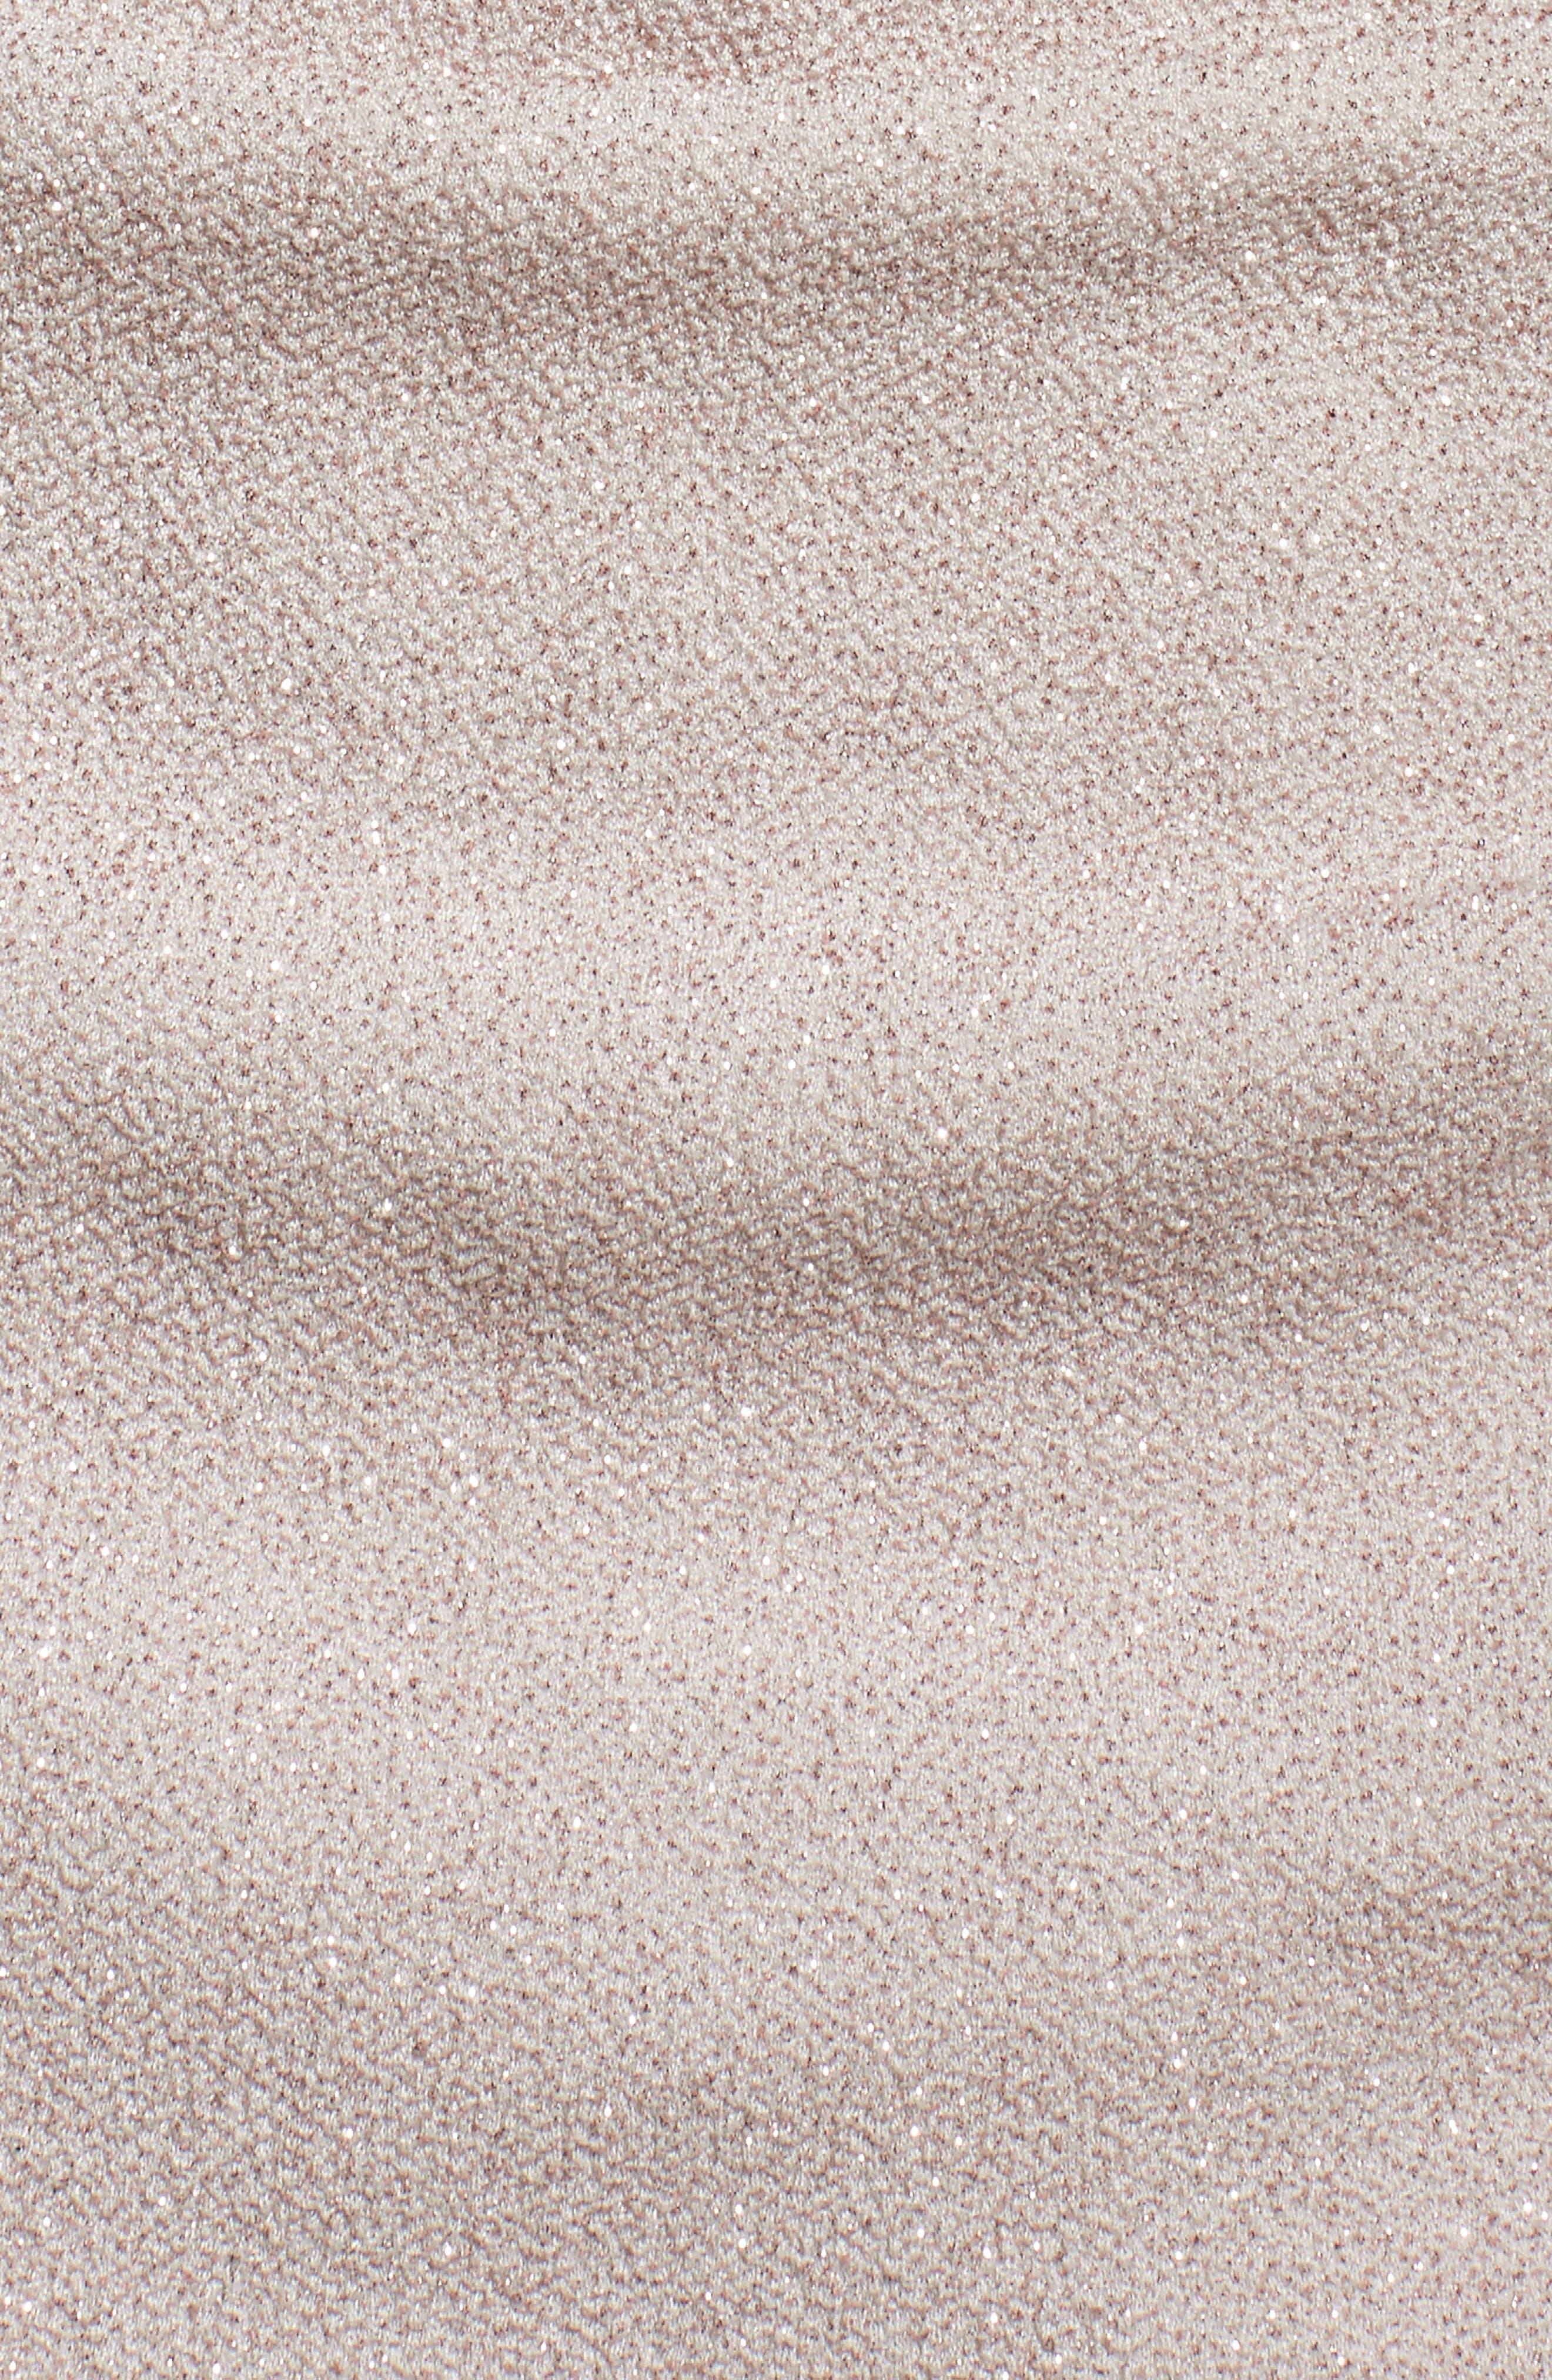 Off the Shoulder Sheath Dress,                             Alternate thumbnail 6, color,                             CHAMPAGNE